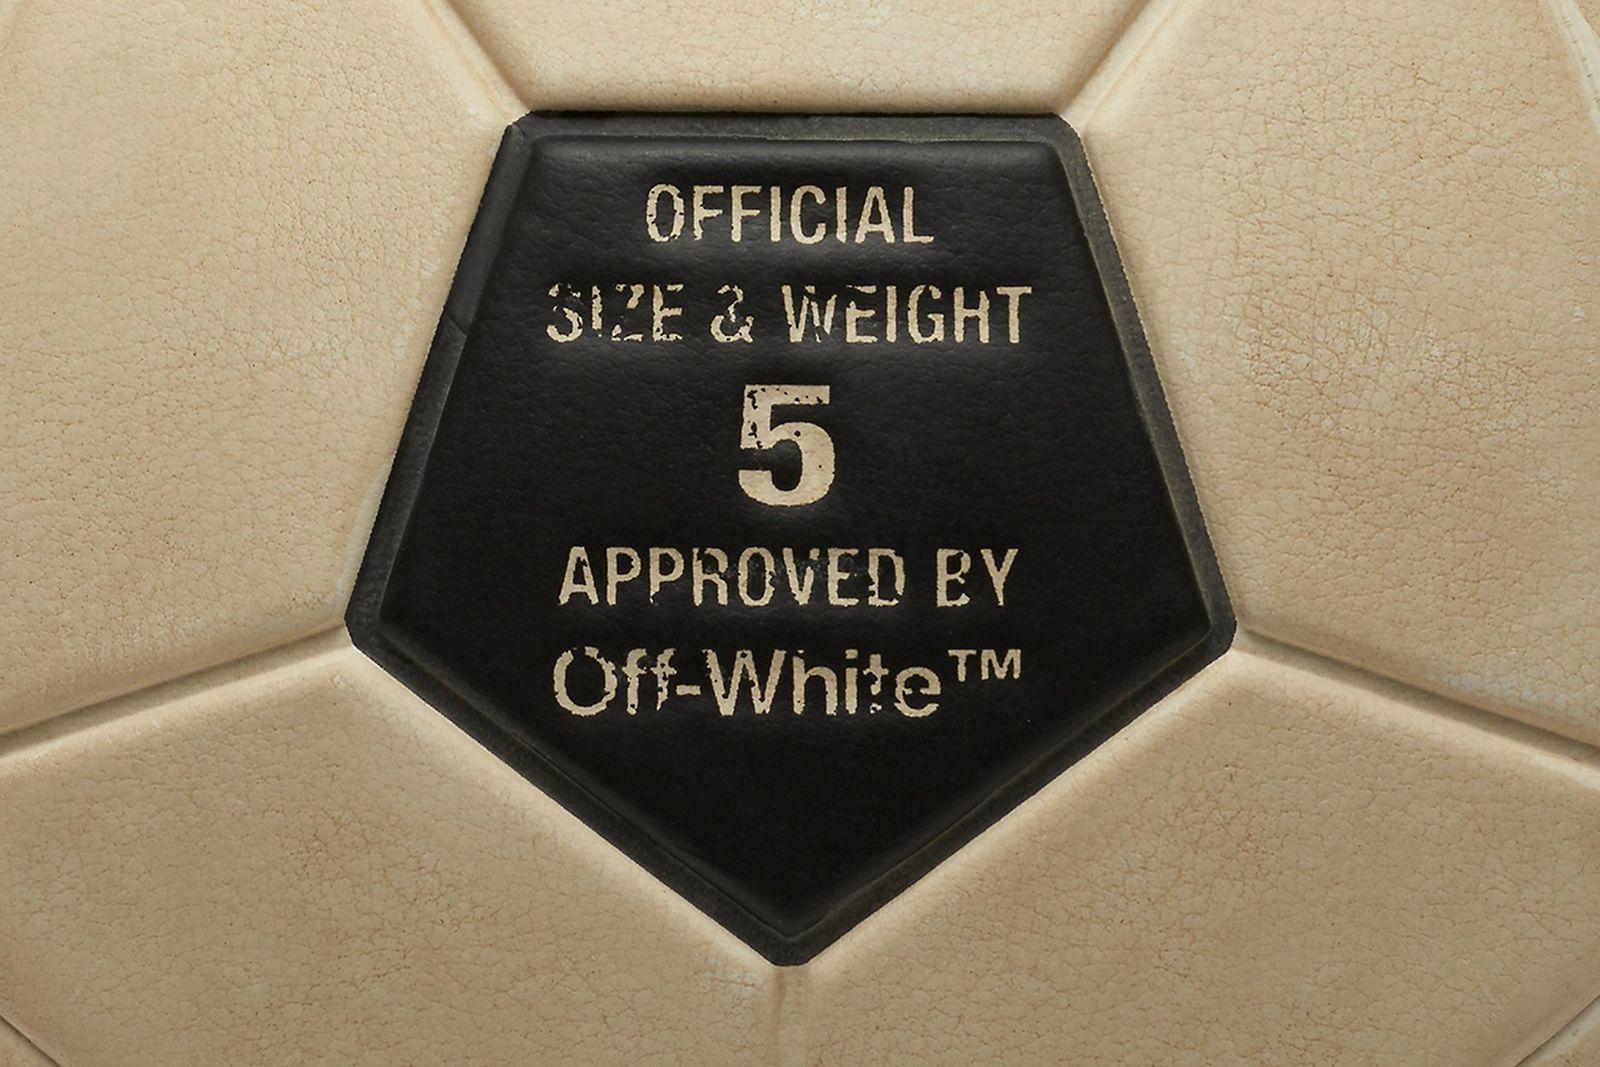 soccer ball1 2018 FIFA World Cup Nike OFF-WHITE c/o Virgil Abloh